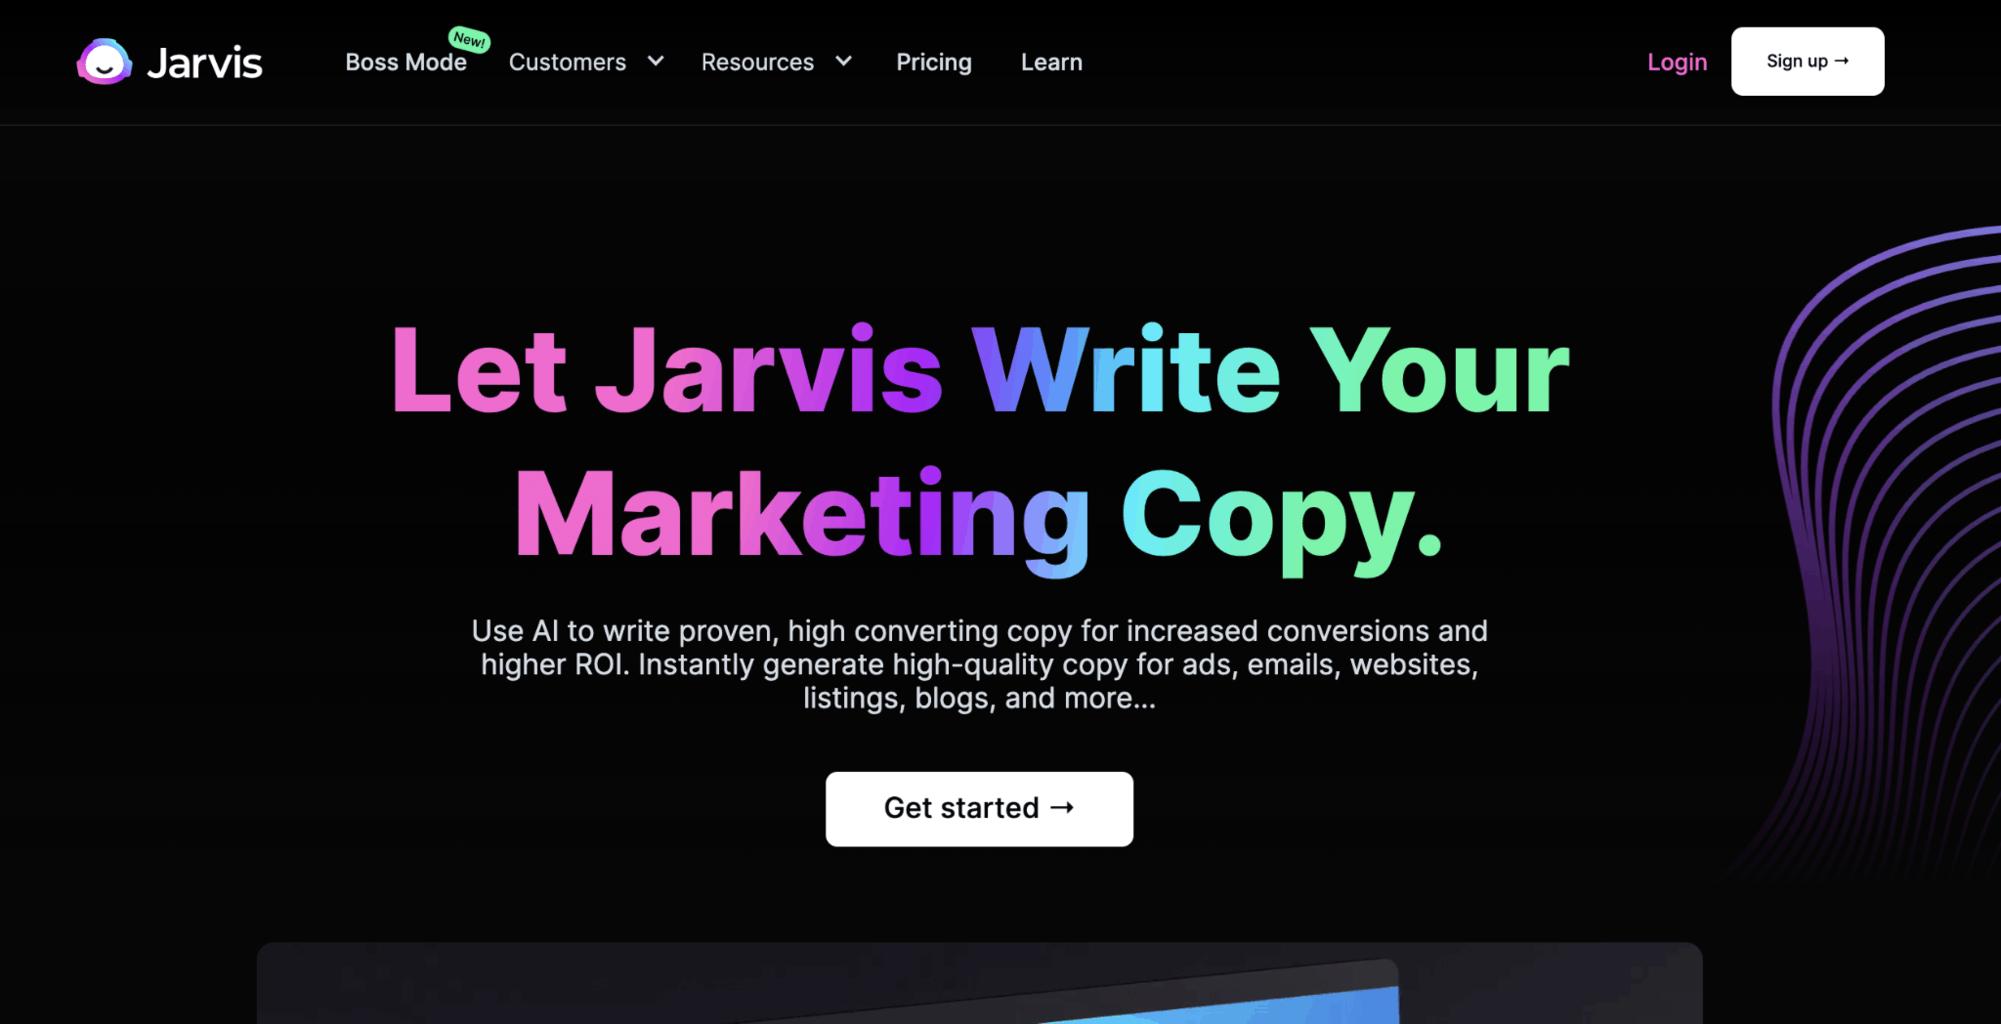 Jarvis tool